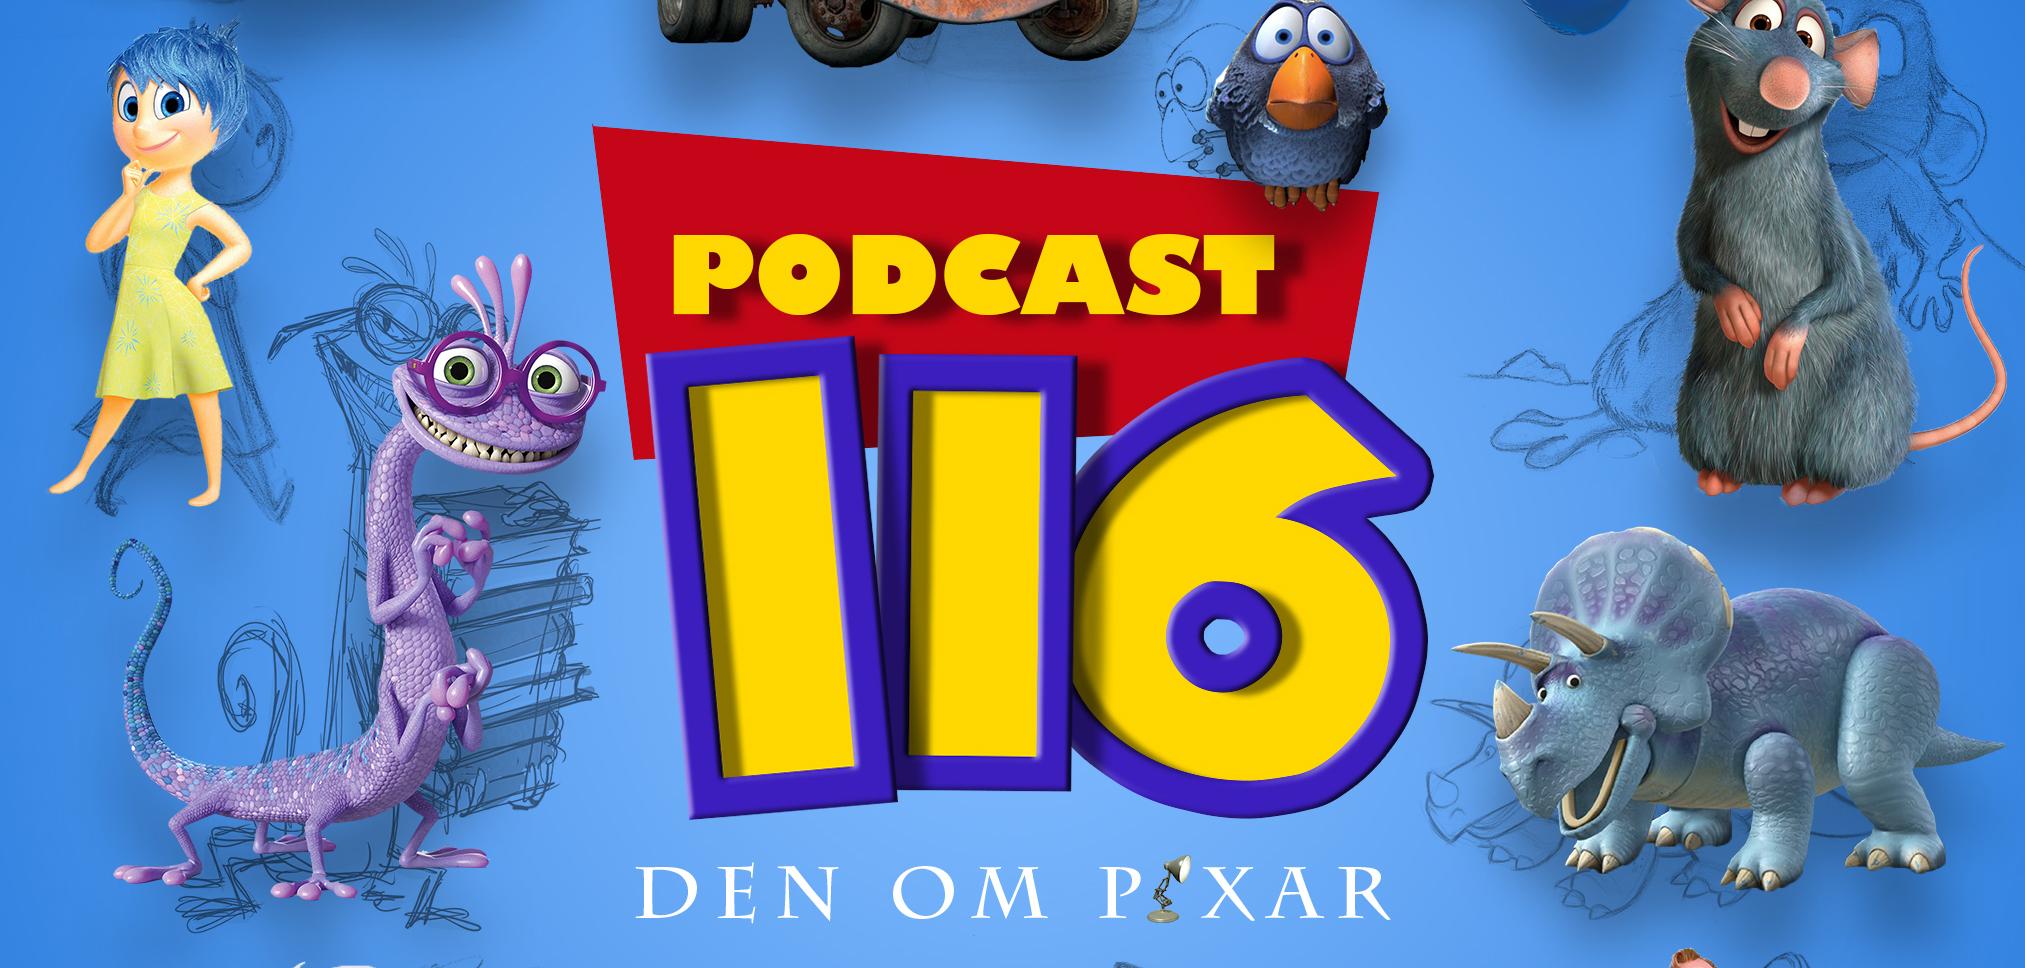 Den om Pixar